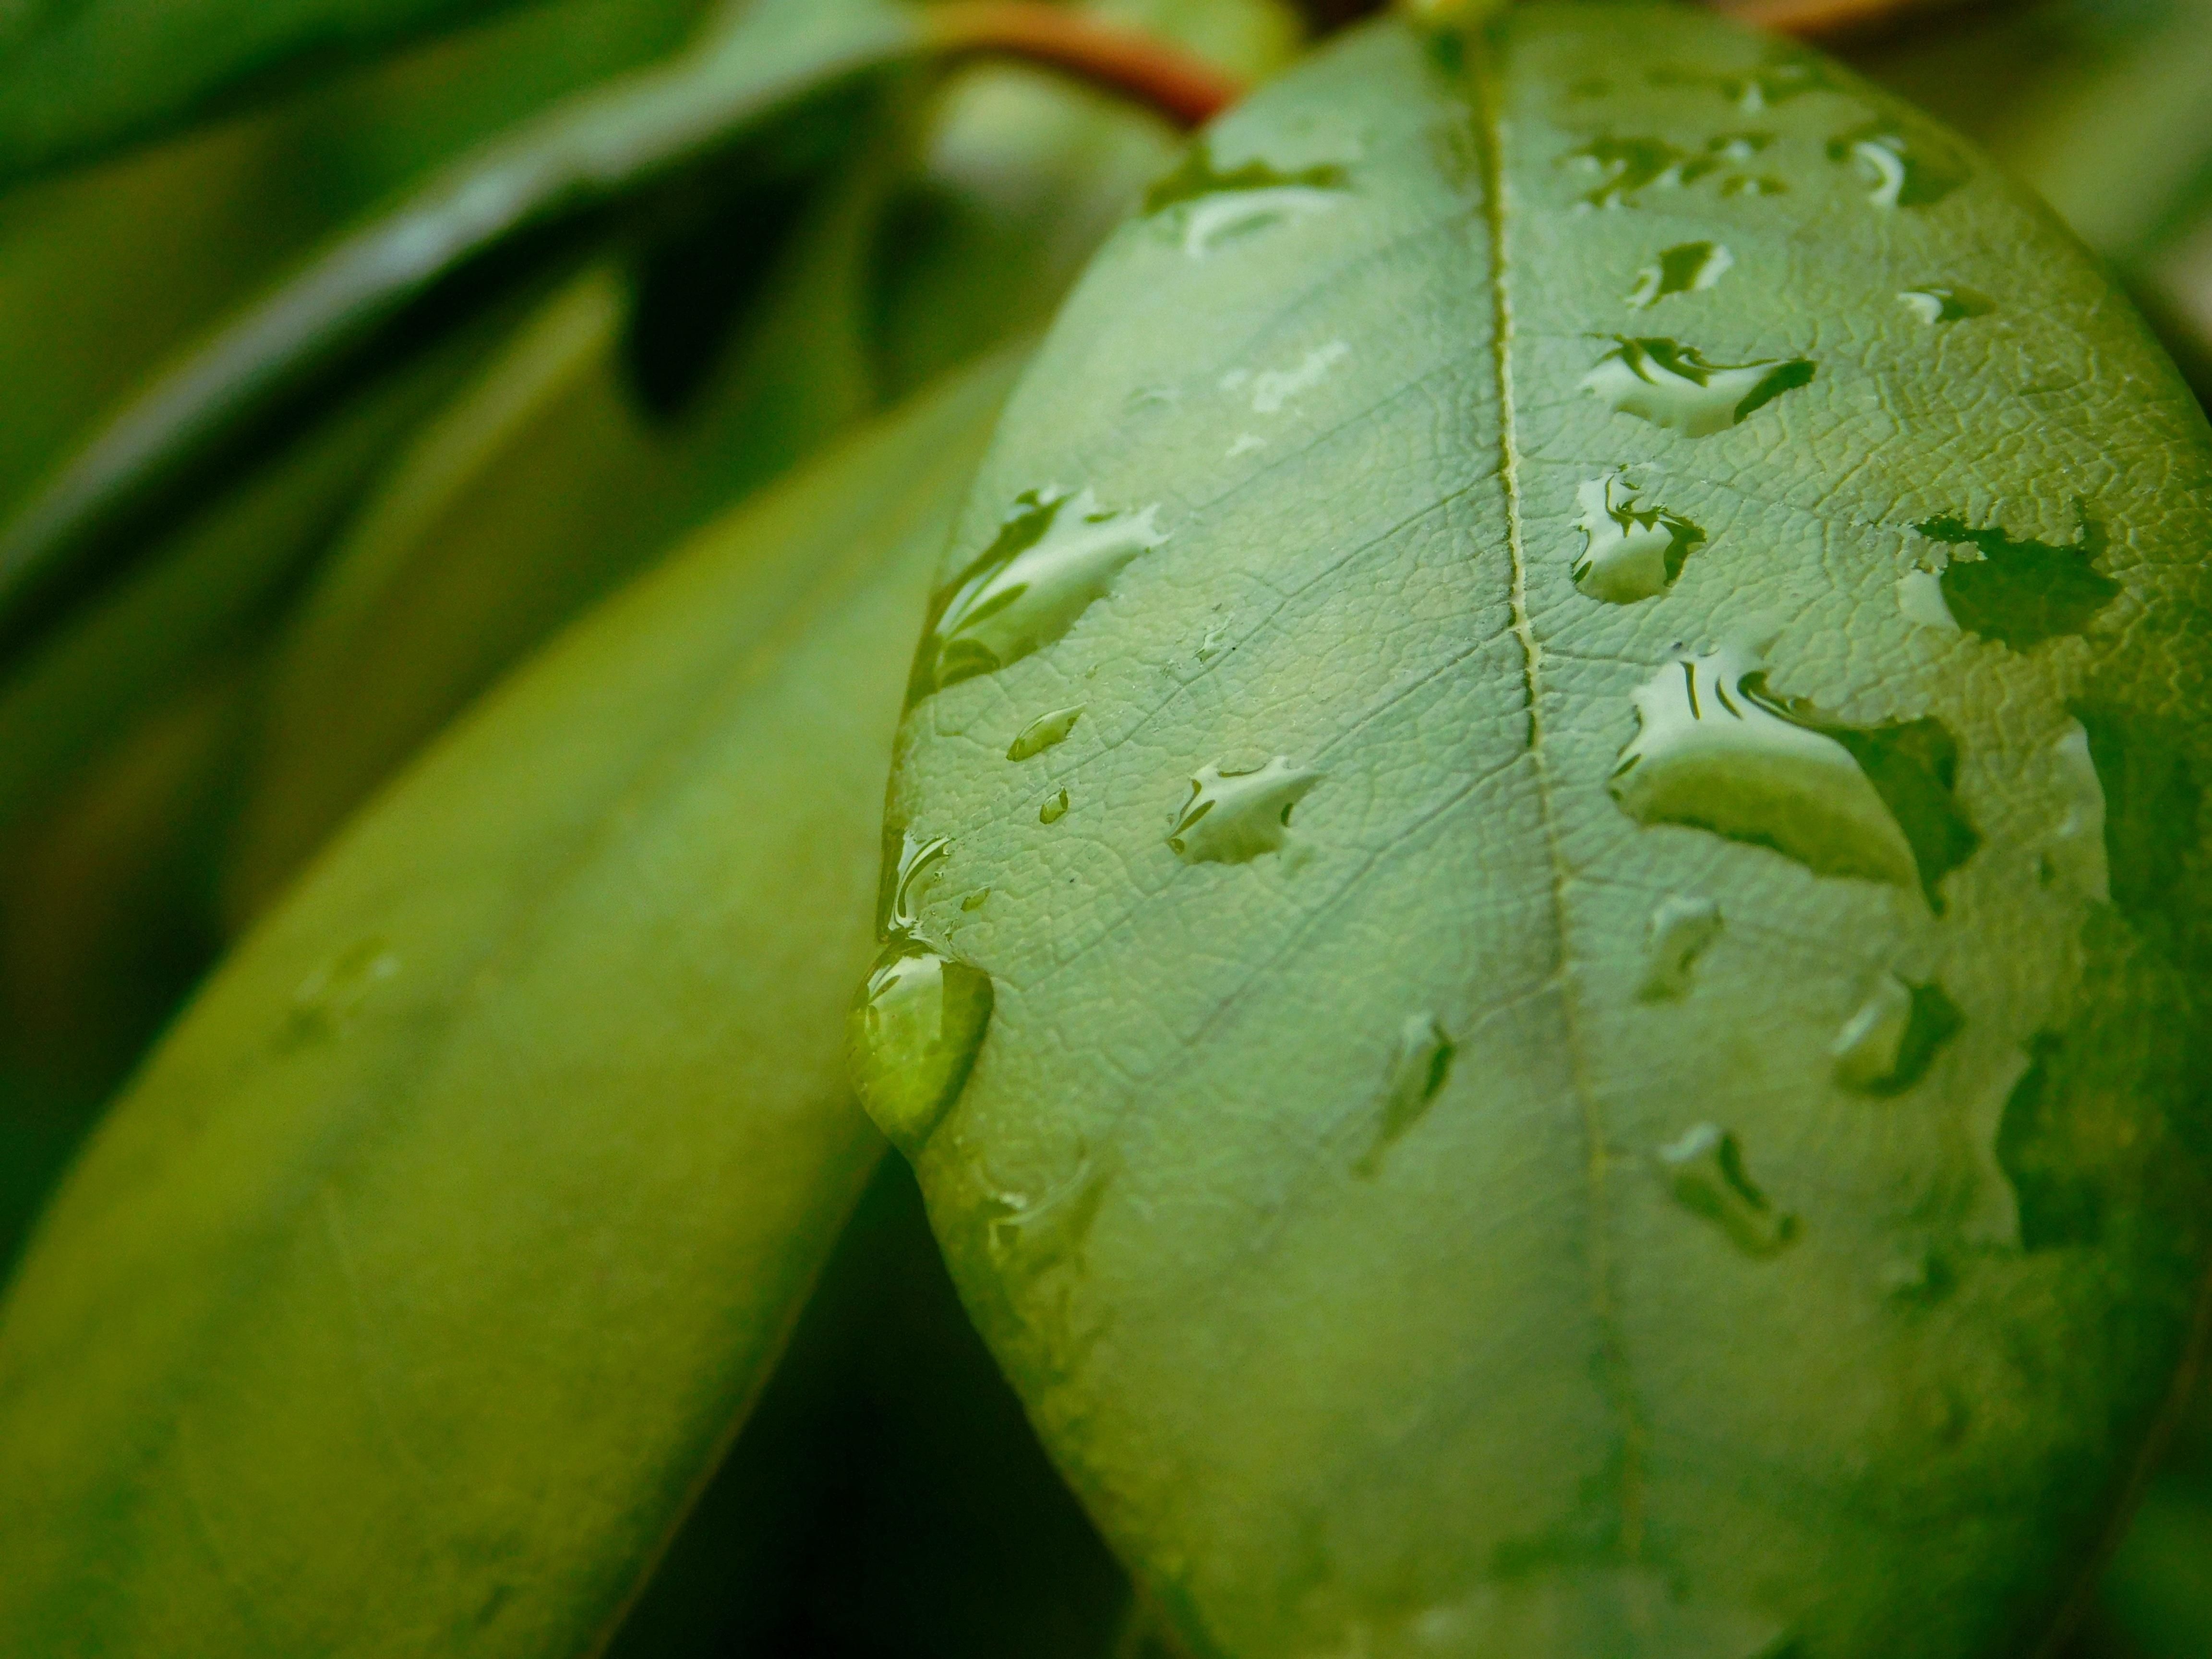 plante verte humidite